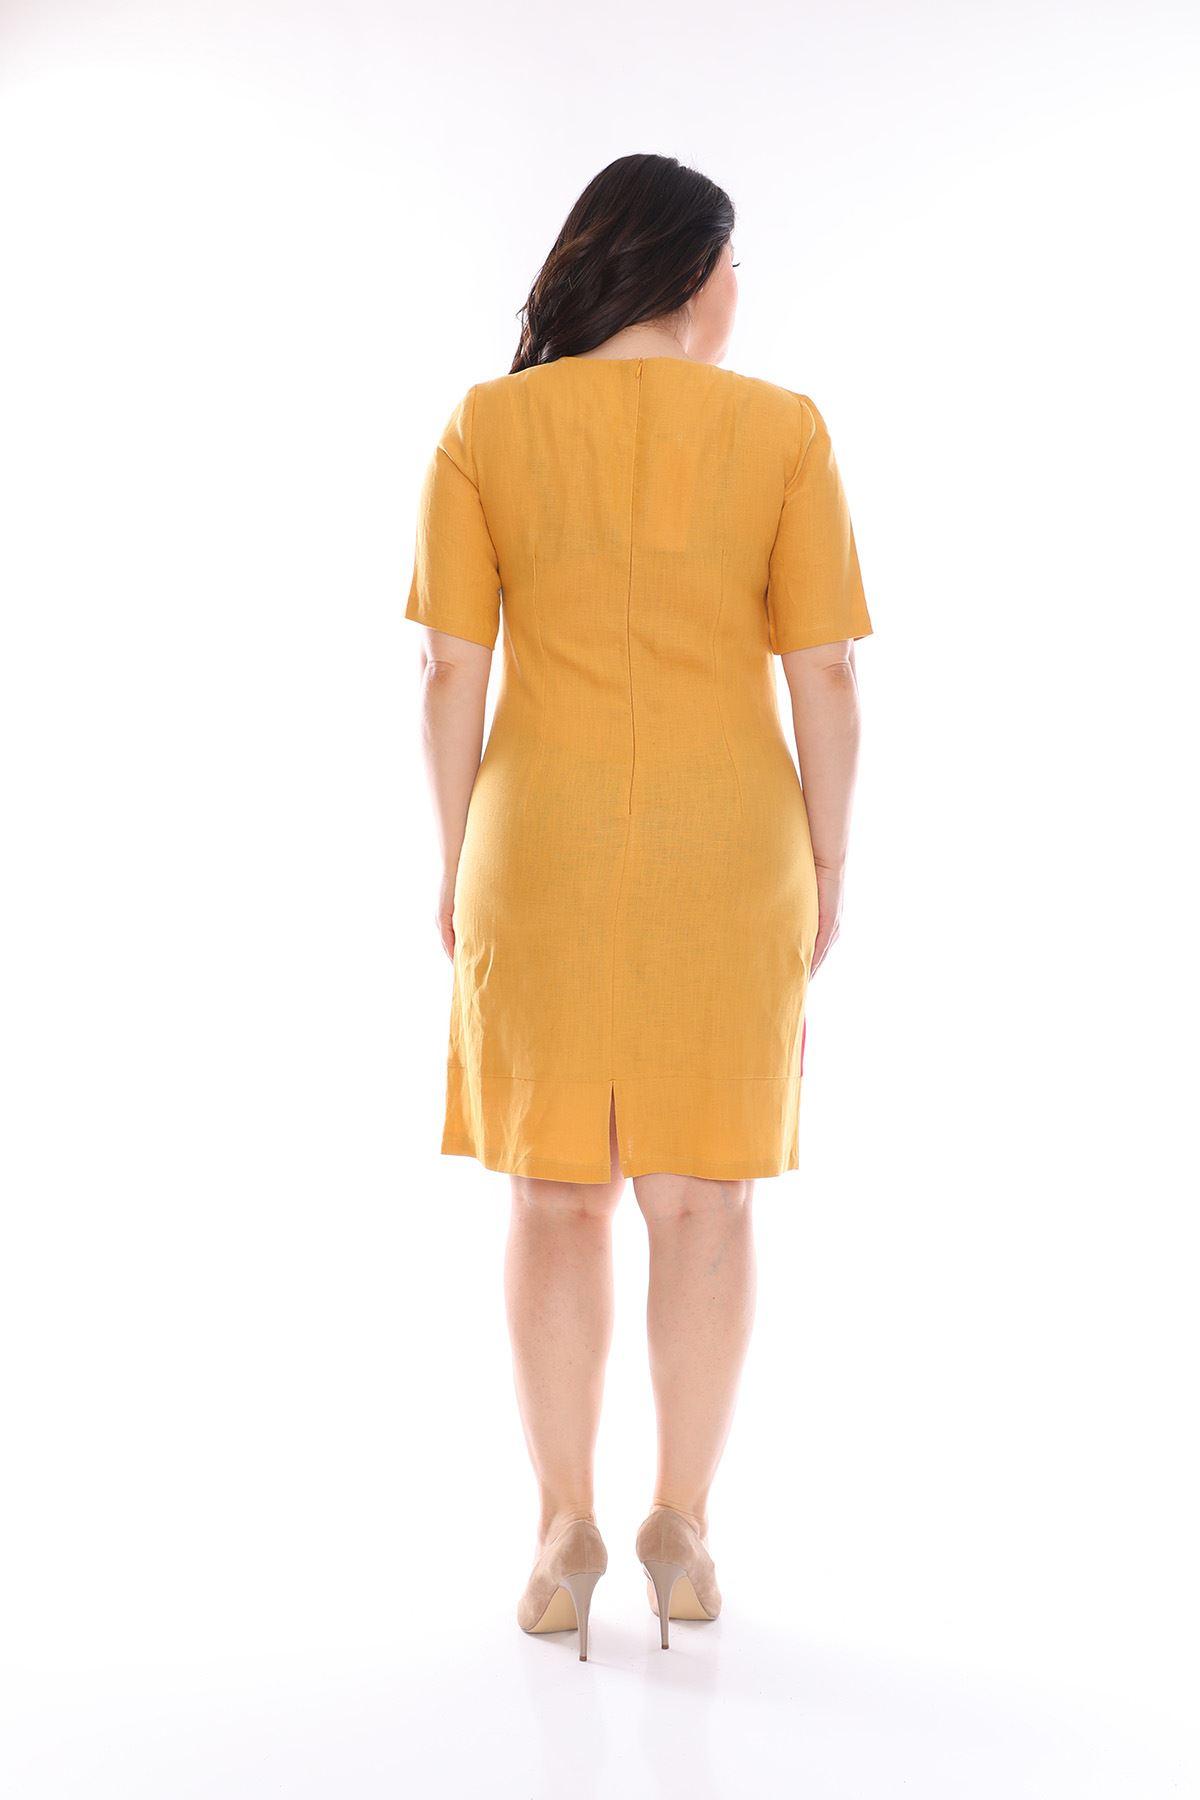 Kısakol Keten Elbise H3-0977